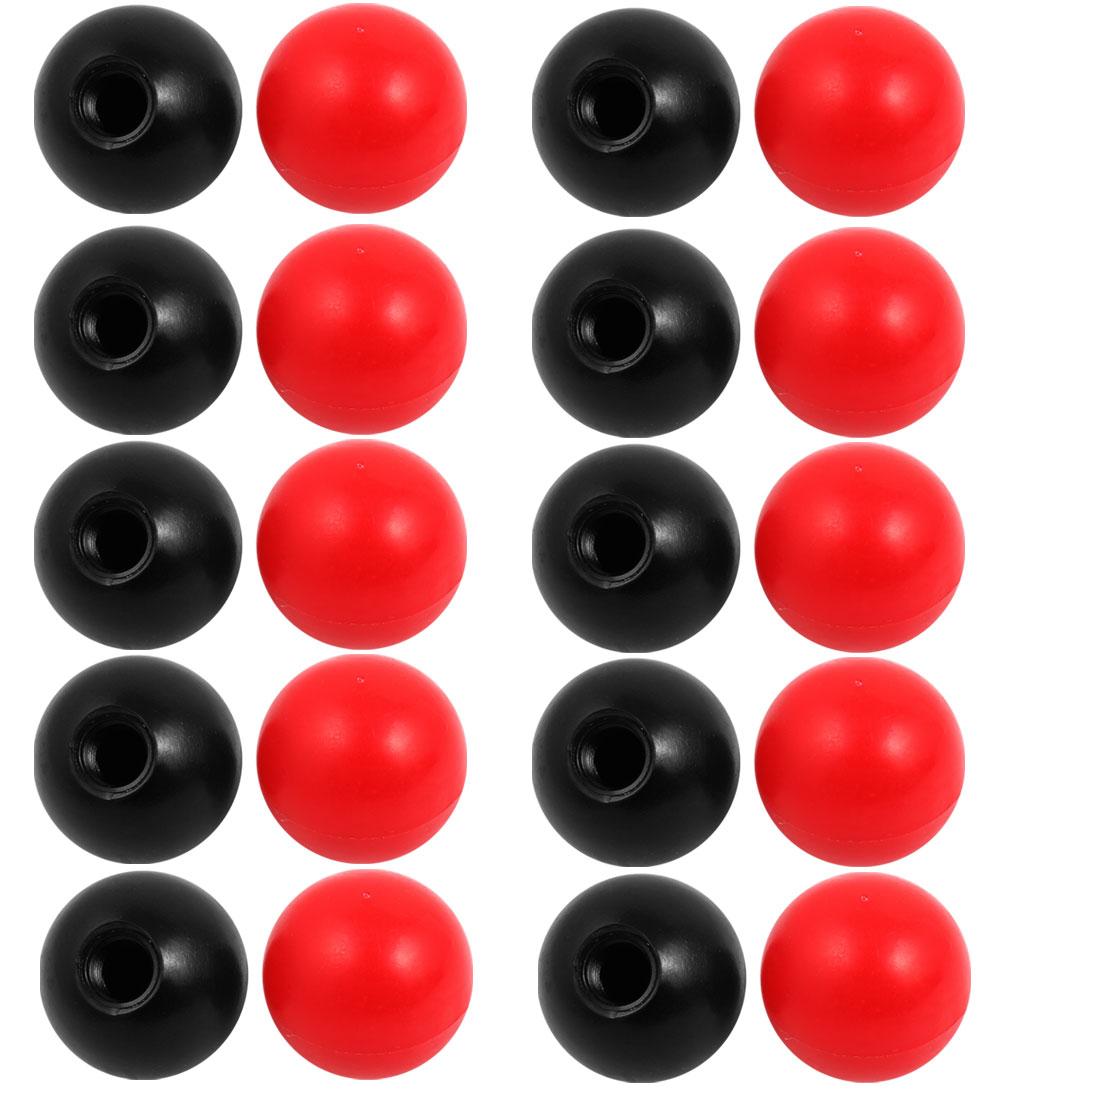 20Pcs Plastic Round Handle Ball Knob M12 Threaded 40mm Dia Mixed Color